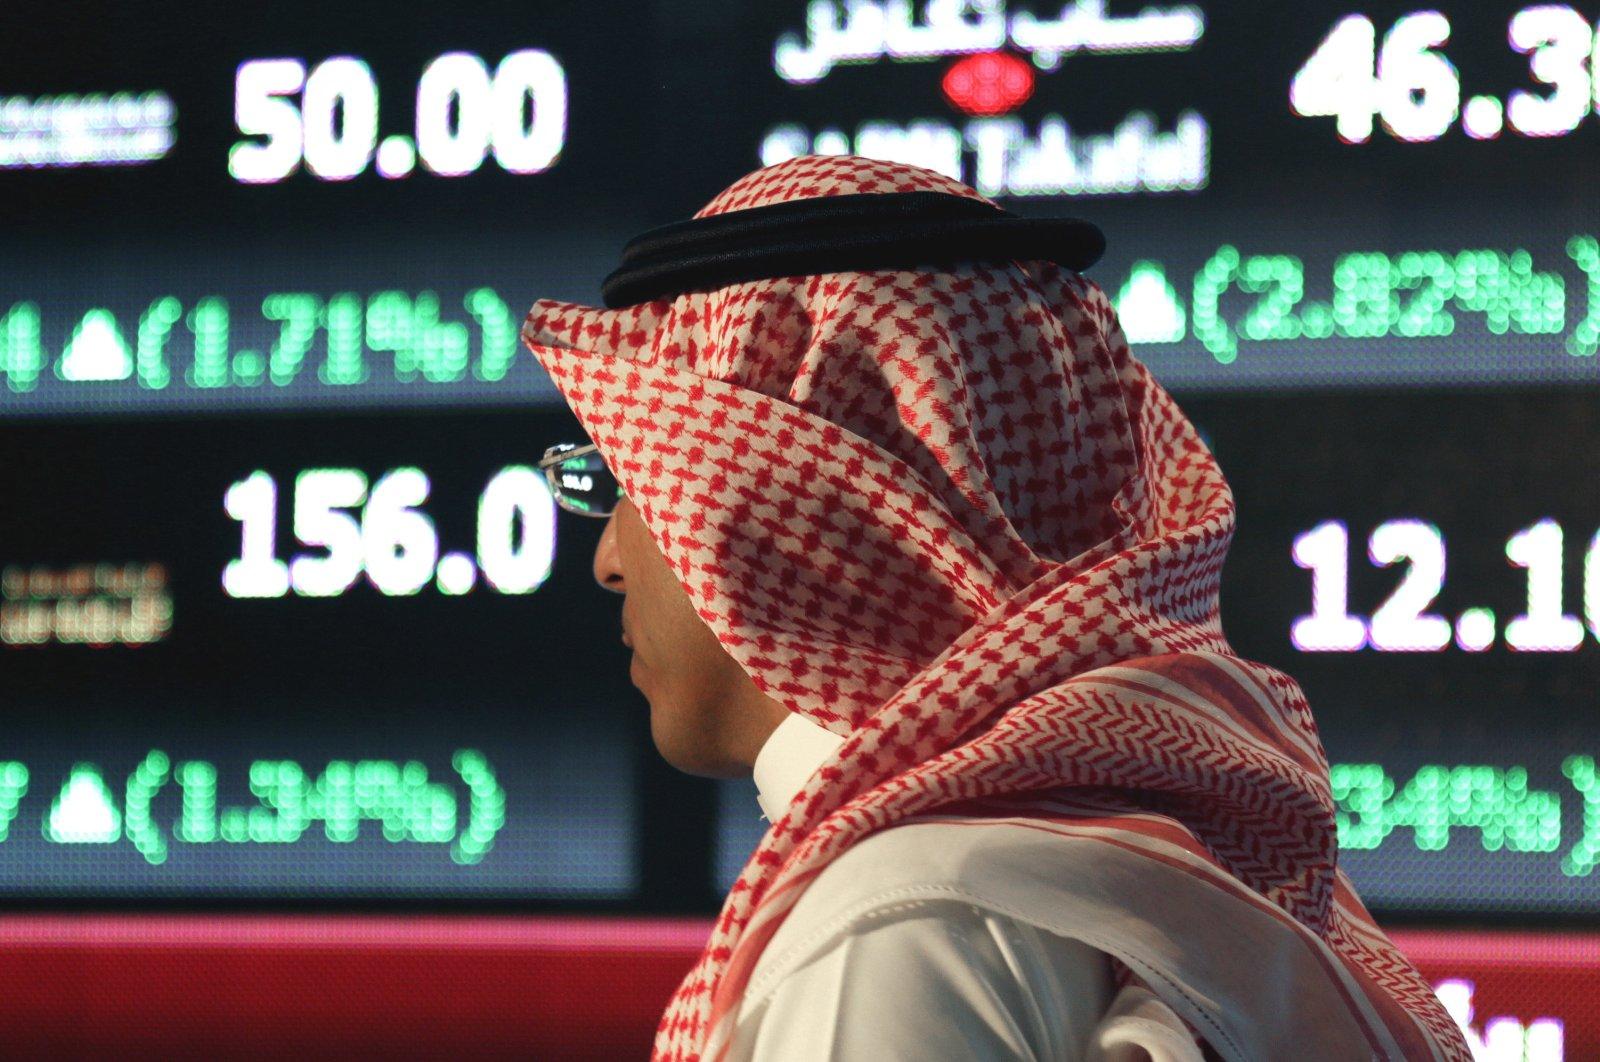 A Saudi man walks through the Tadawul stock exchange in Riyadh, Saudi Arabia on June 15, 2015. (AP Photo)